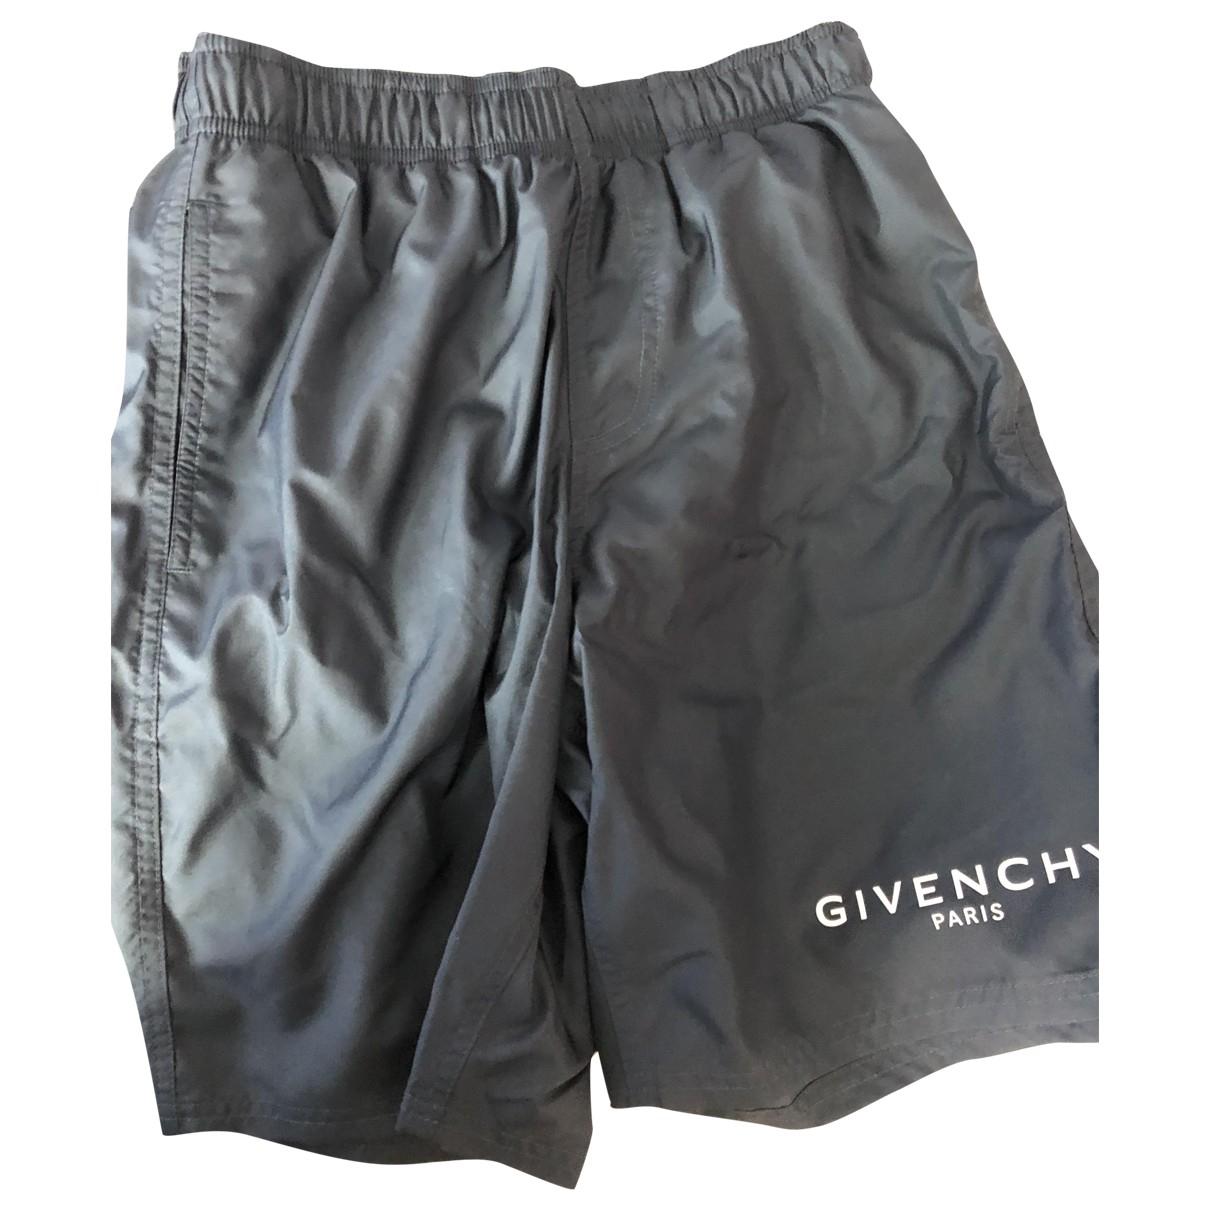 Givenchy \N Grey Swimwear for Men S International